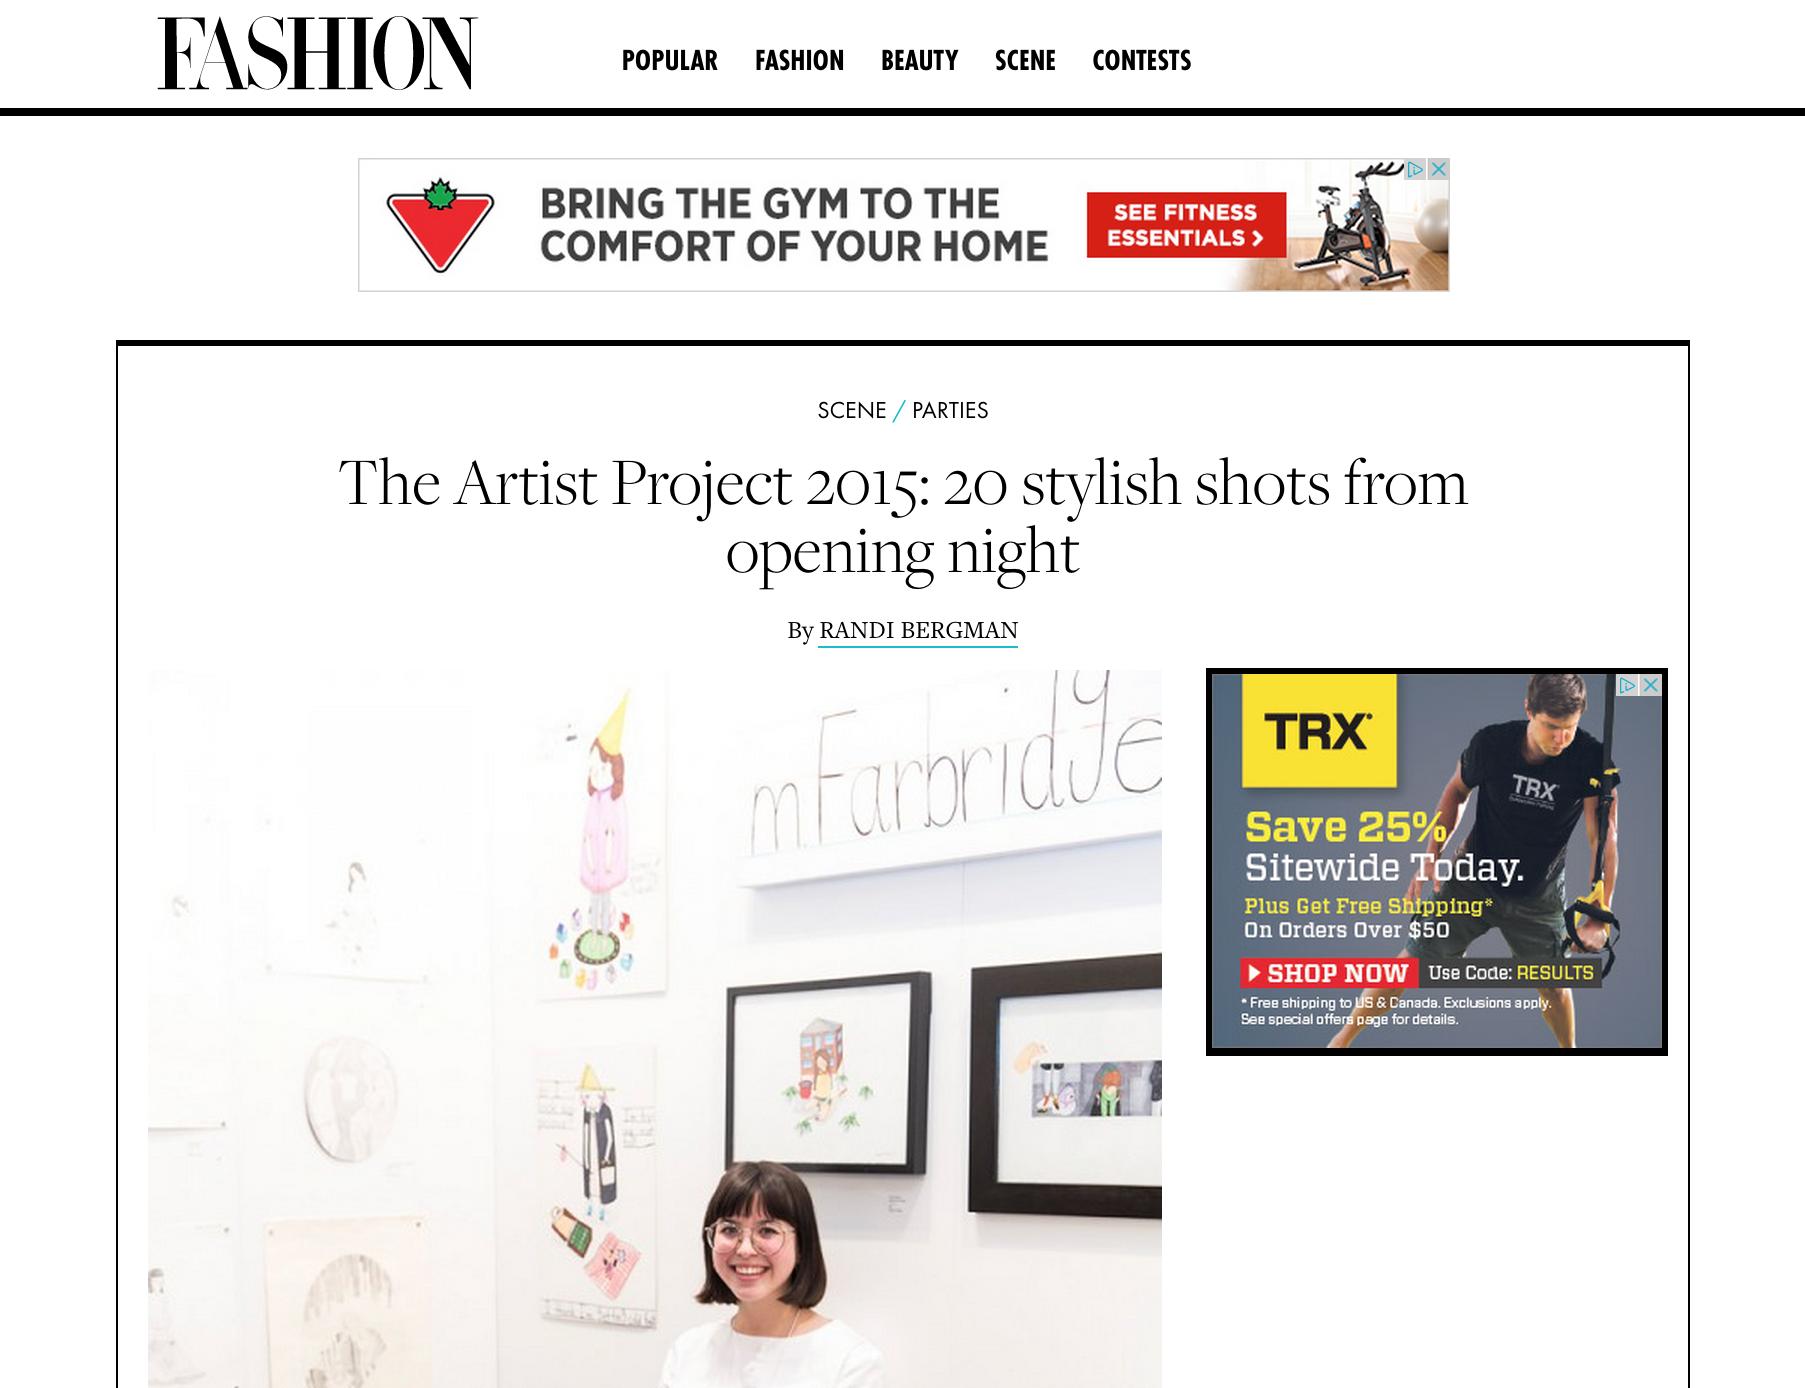 Fashion Magazine, 2015 (1/2)